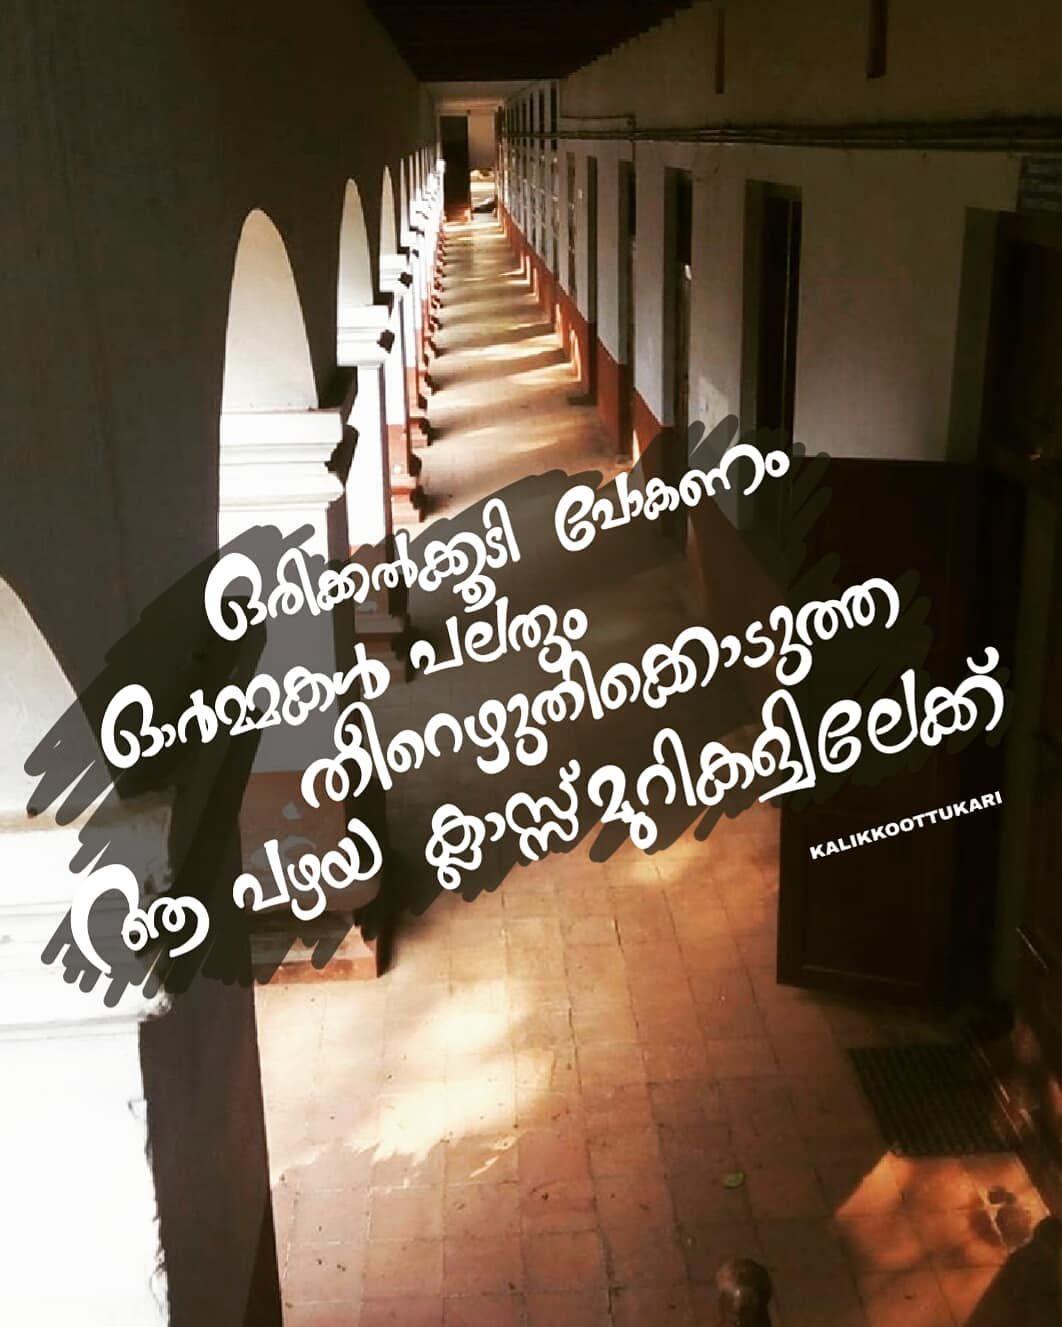 7 Teachers Day Greeting Card In Malayalam In 2020 Teachers Day Greeting Card Teachers Day Card Teachers Day Greetings